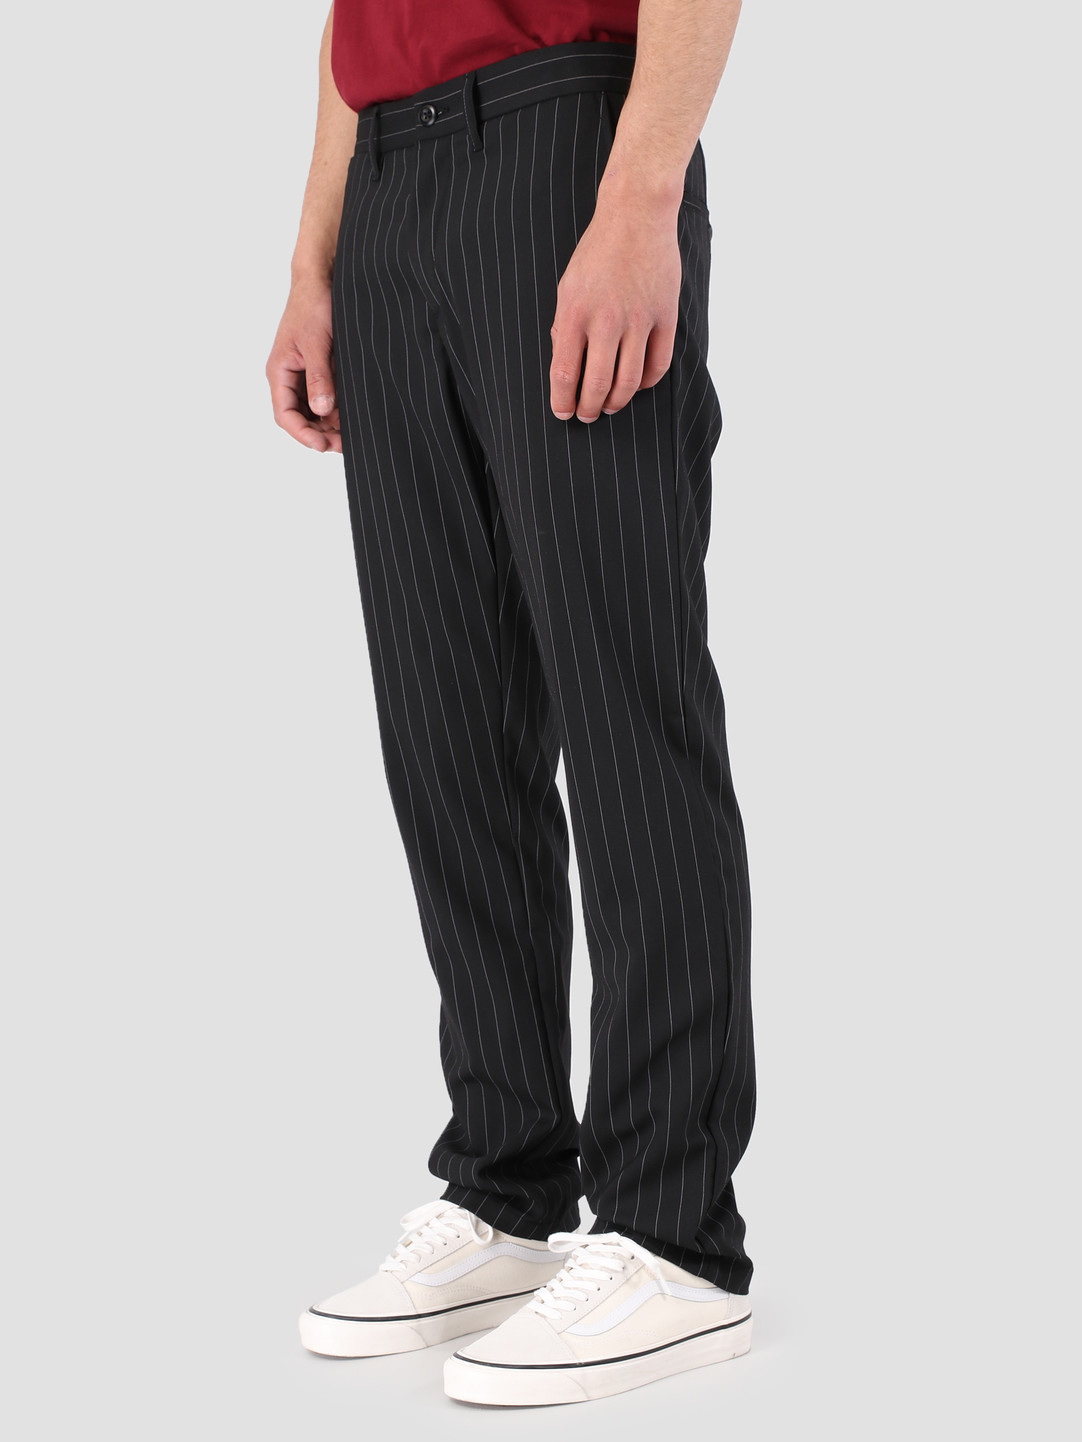 Carhartt WIP Carhartt WIP Johnson Pant Rigid Pinstripe Black White I023003